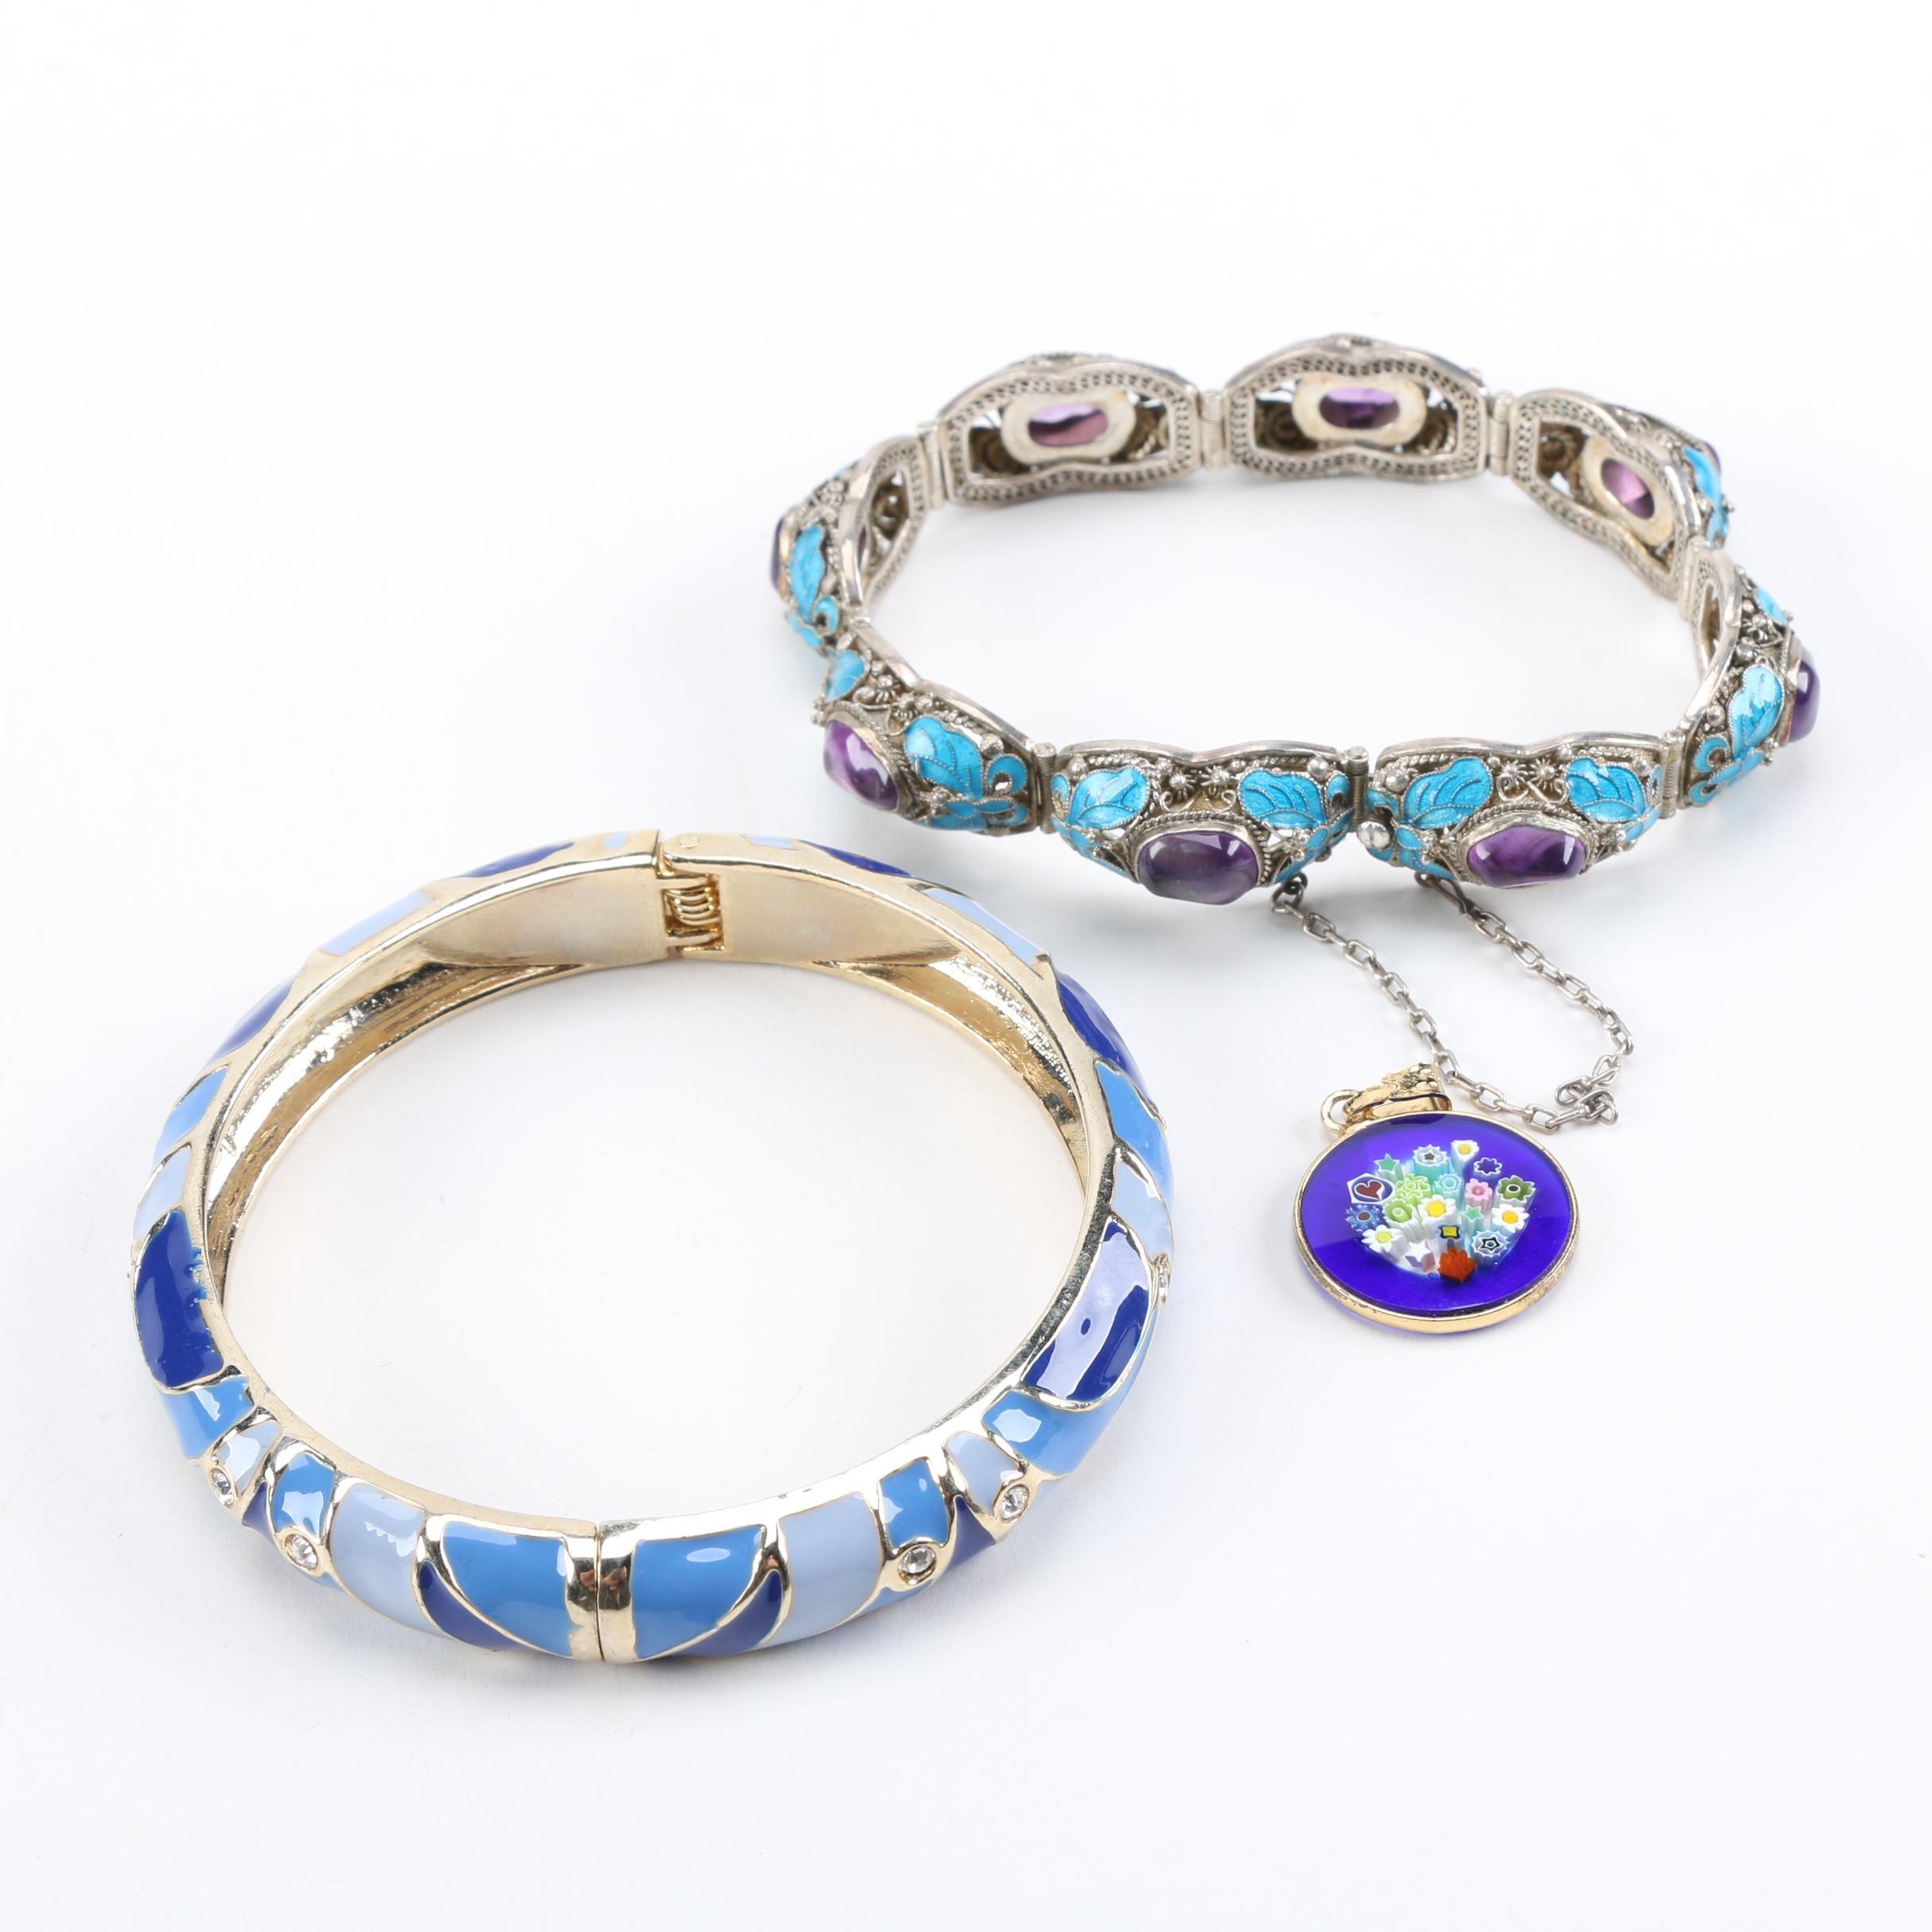 Sterling Silver Bracelets and Millefiori Pendant